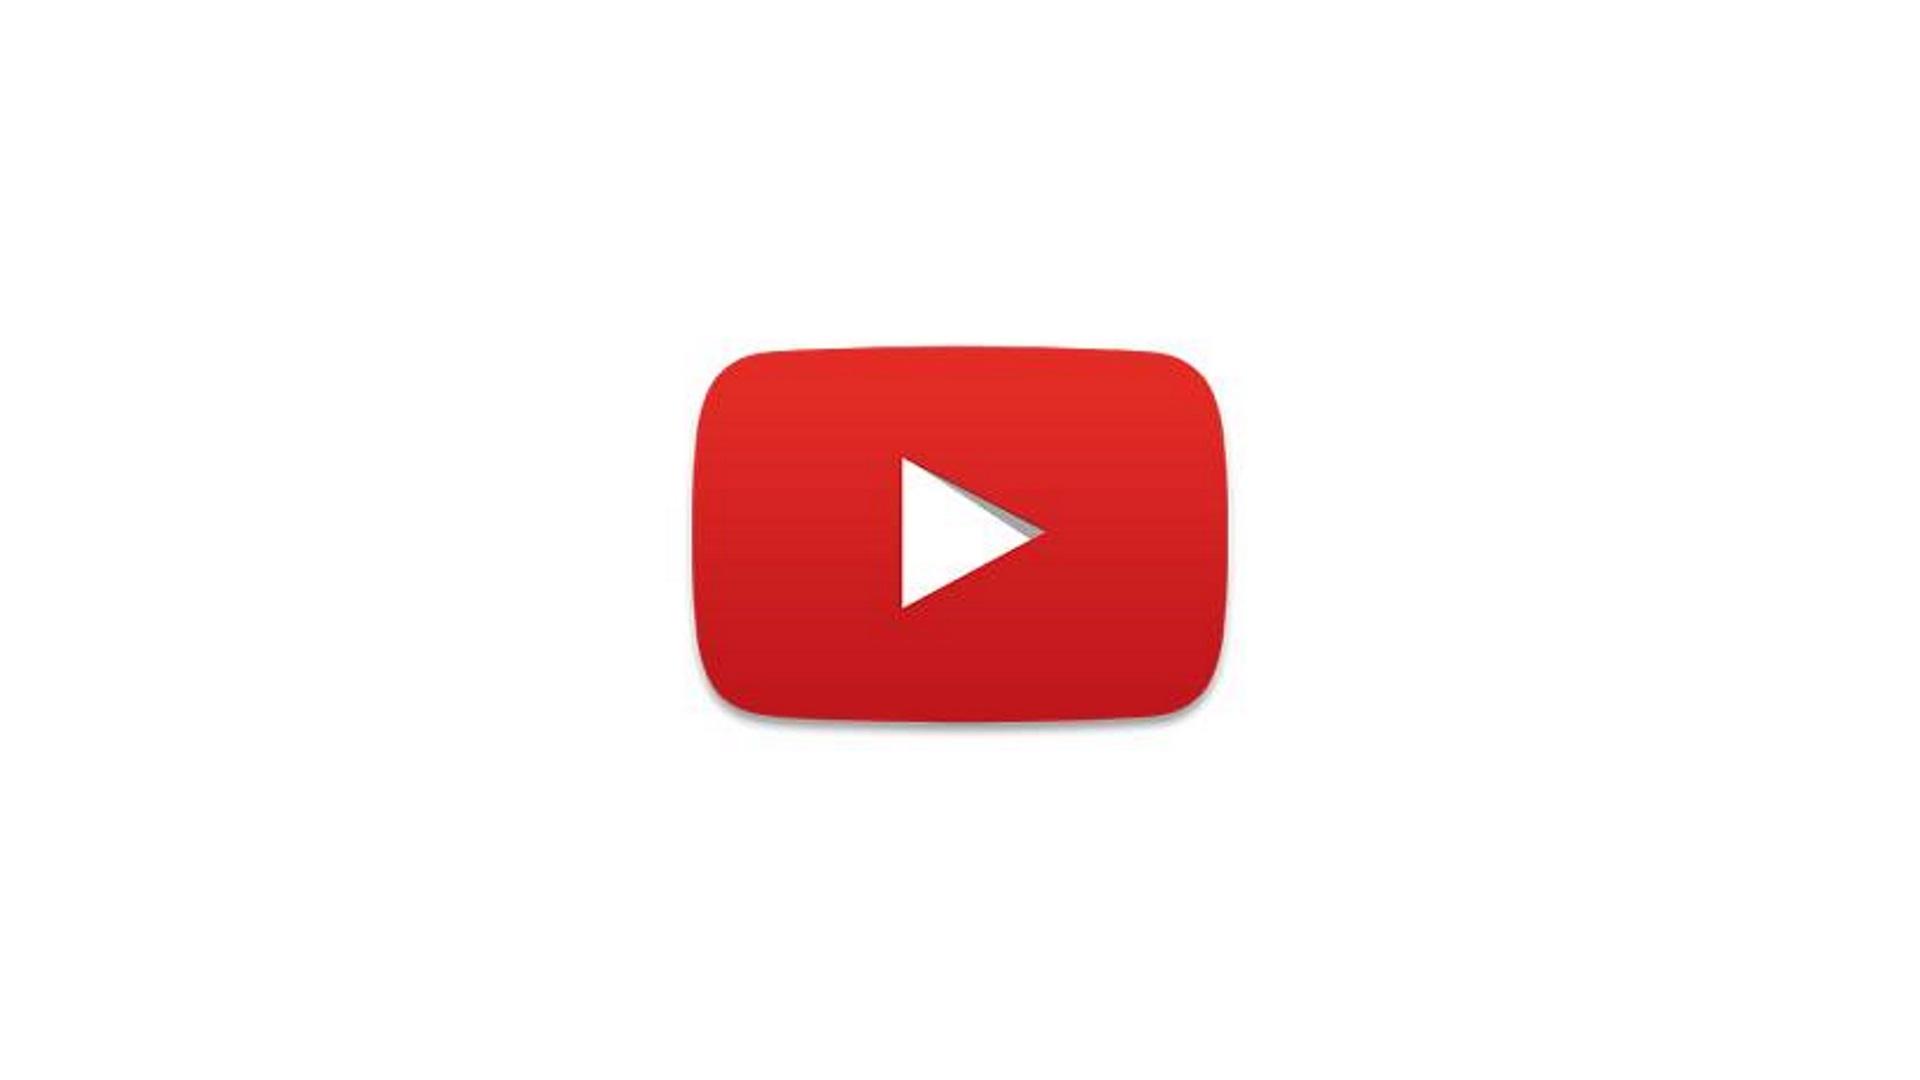 Android版「YouTube」アプリの動画最小化表示が一部機種でバータイプに変更される